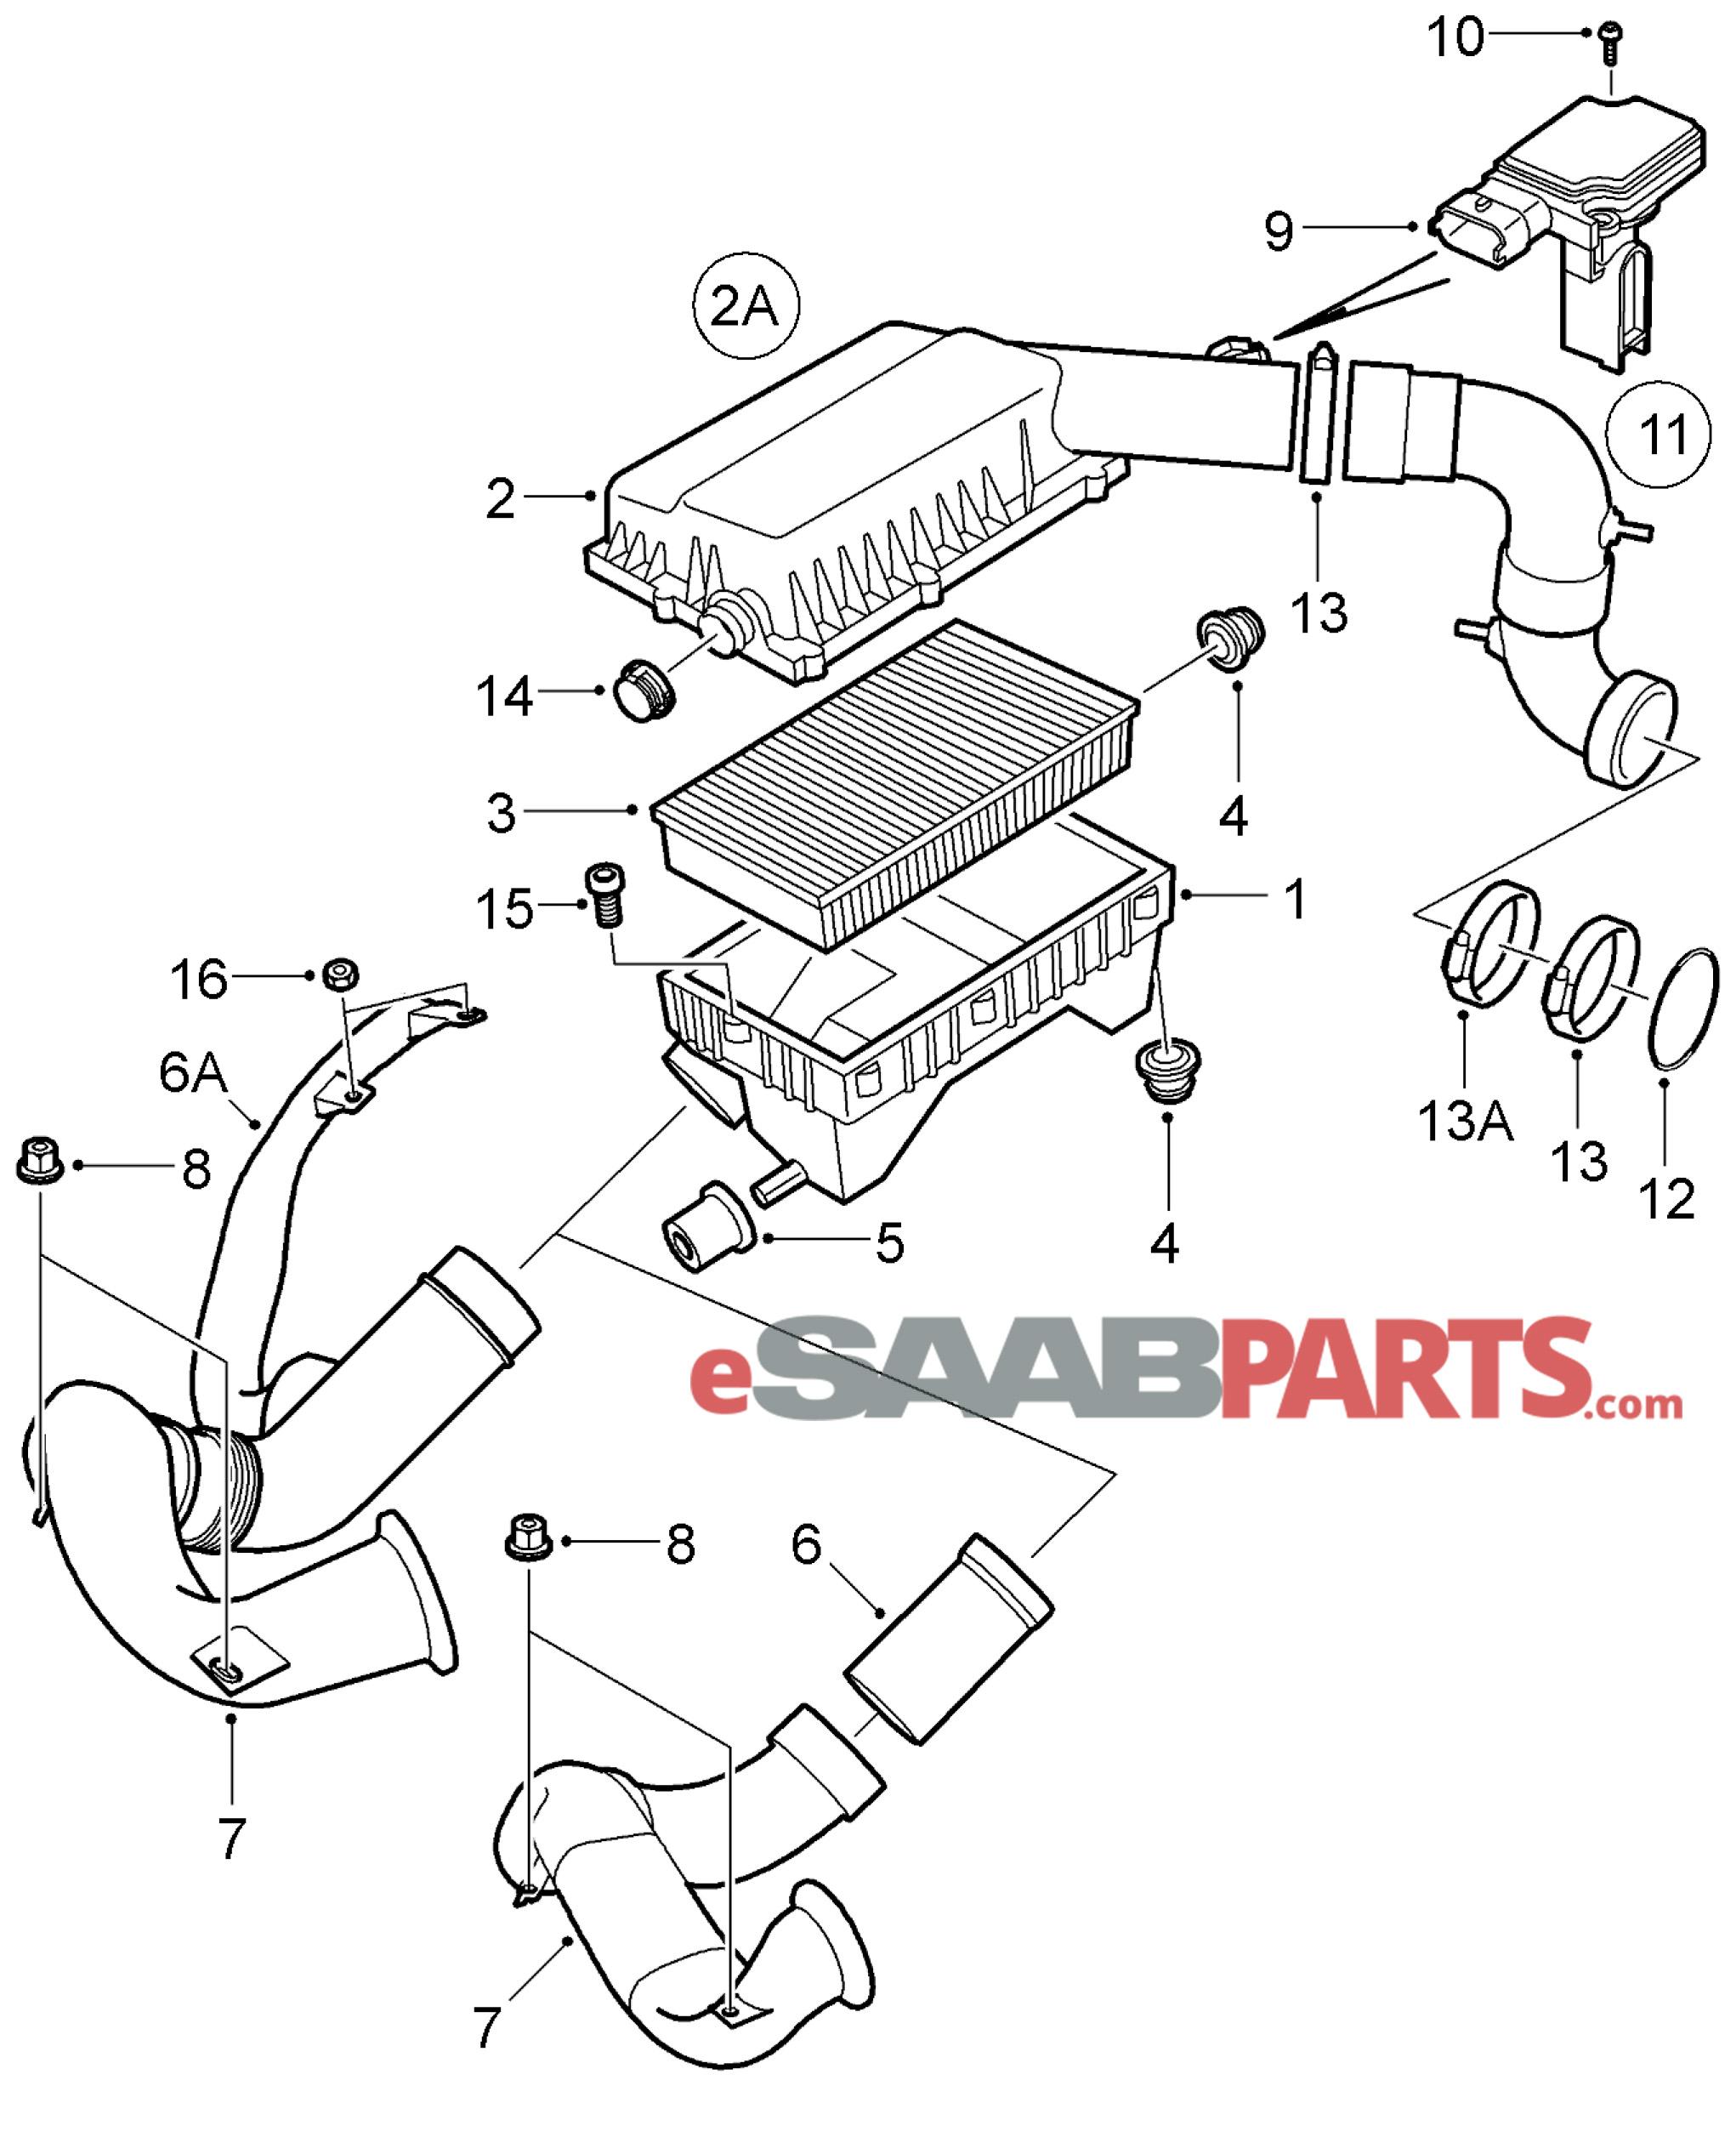 12788131 saab mass air flow sensor genuine saab parts from rh esaabparts saab oem parts diagram saab 900 parts diagram